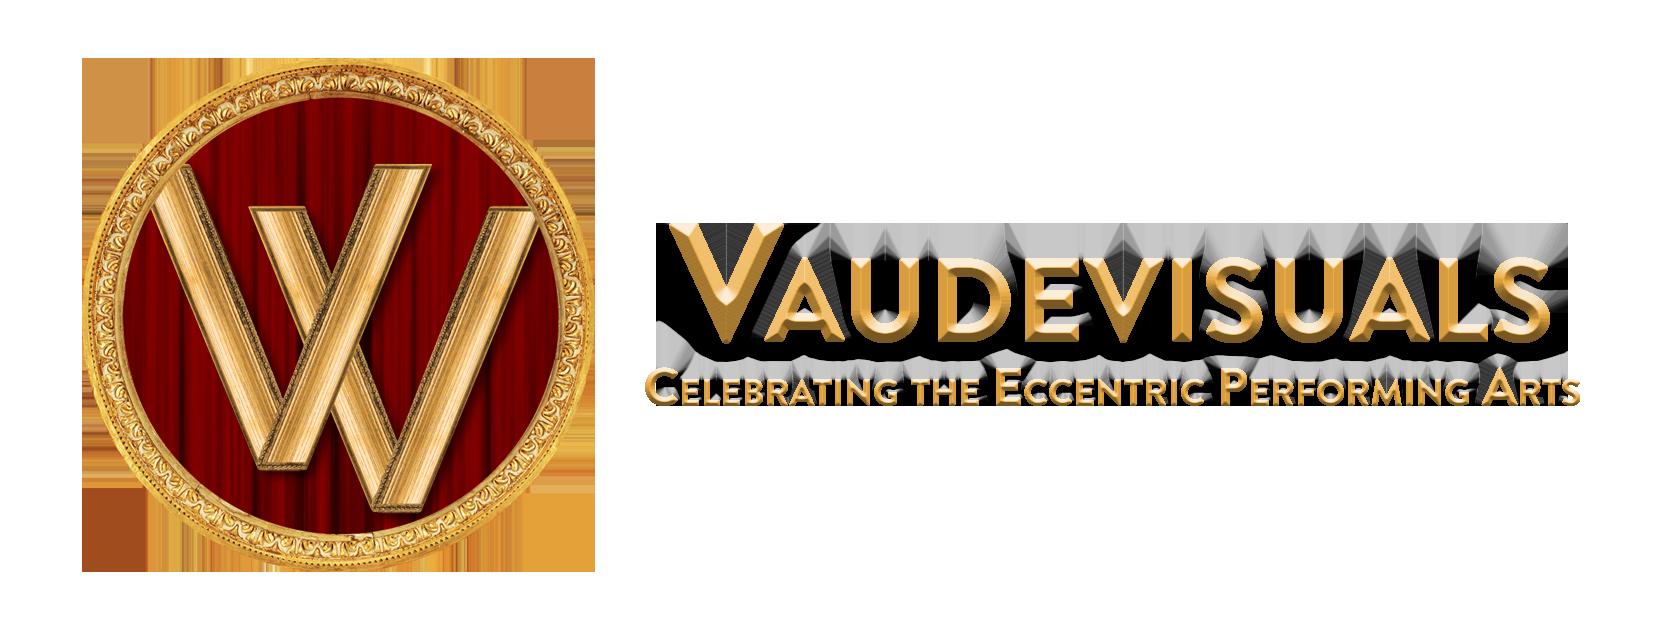 VaudeVisuals